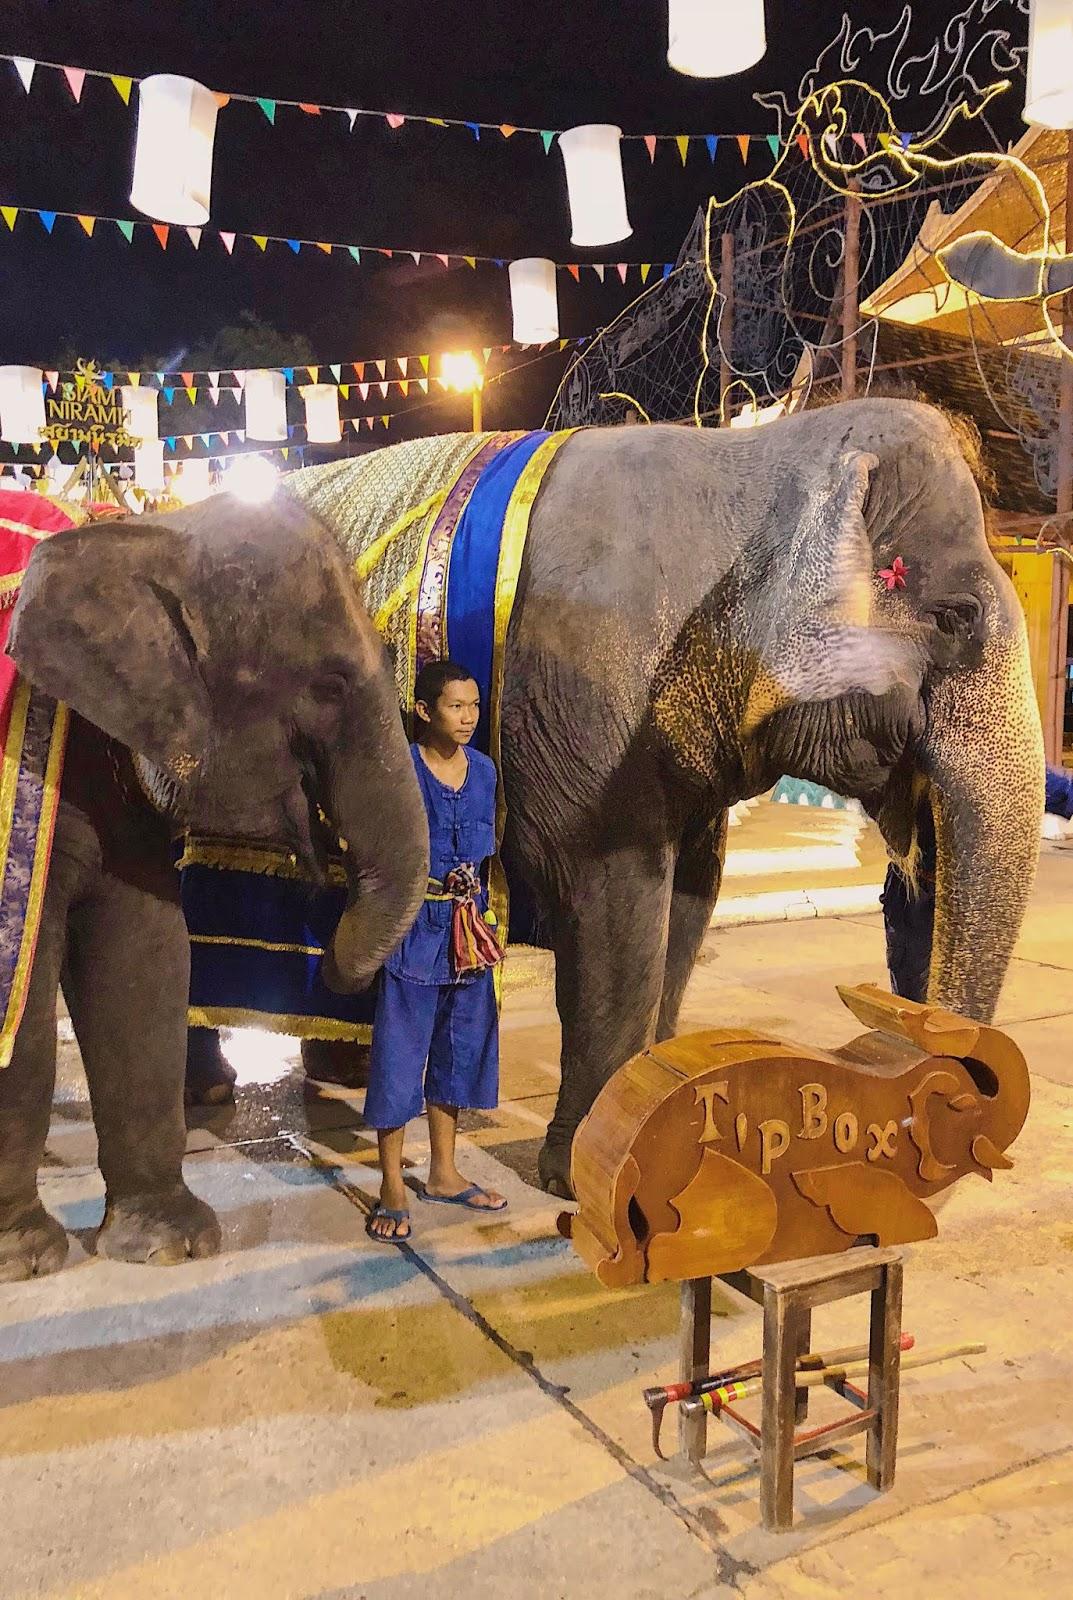 Siam niramit elephant performers